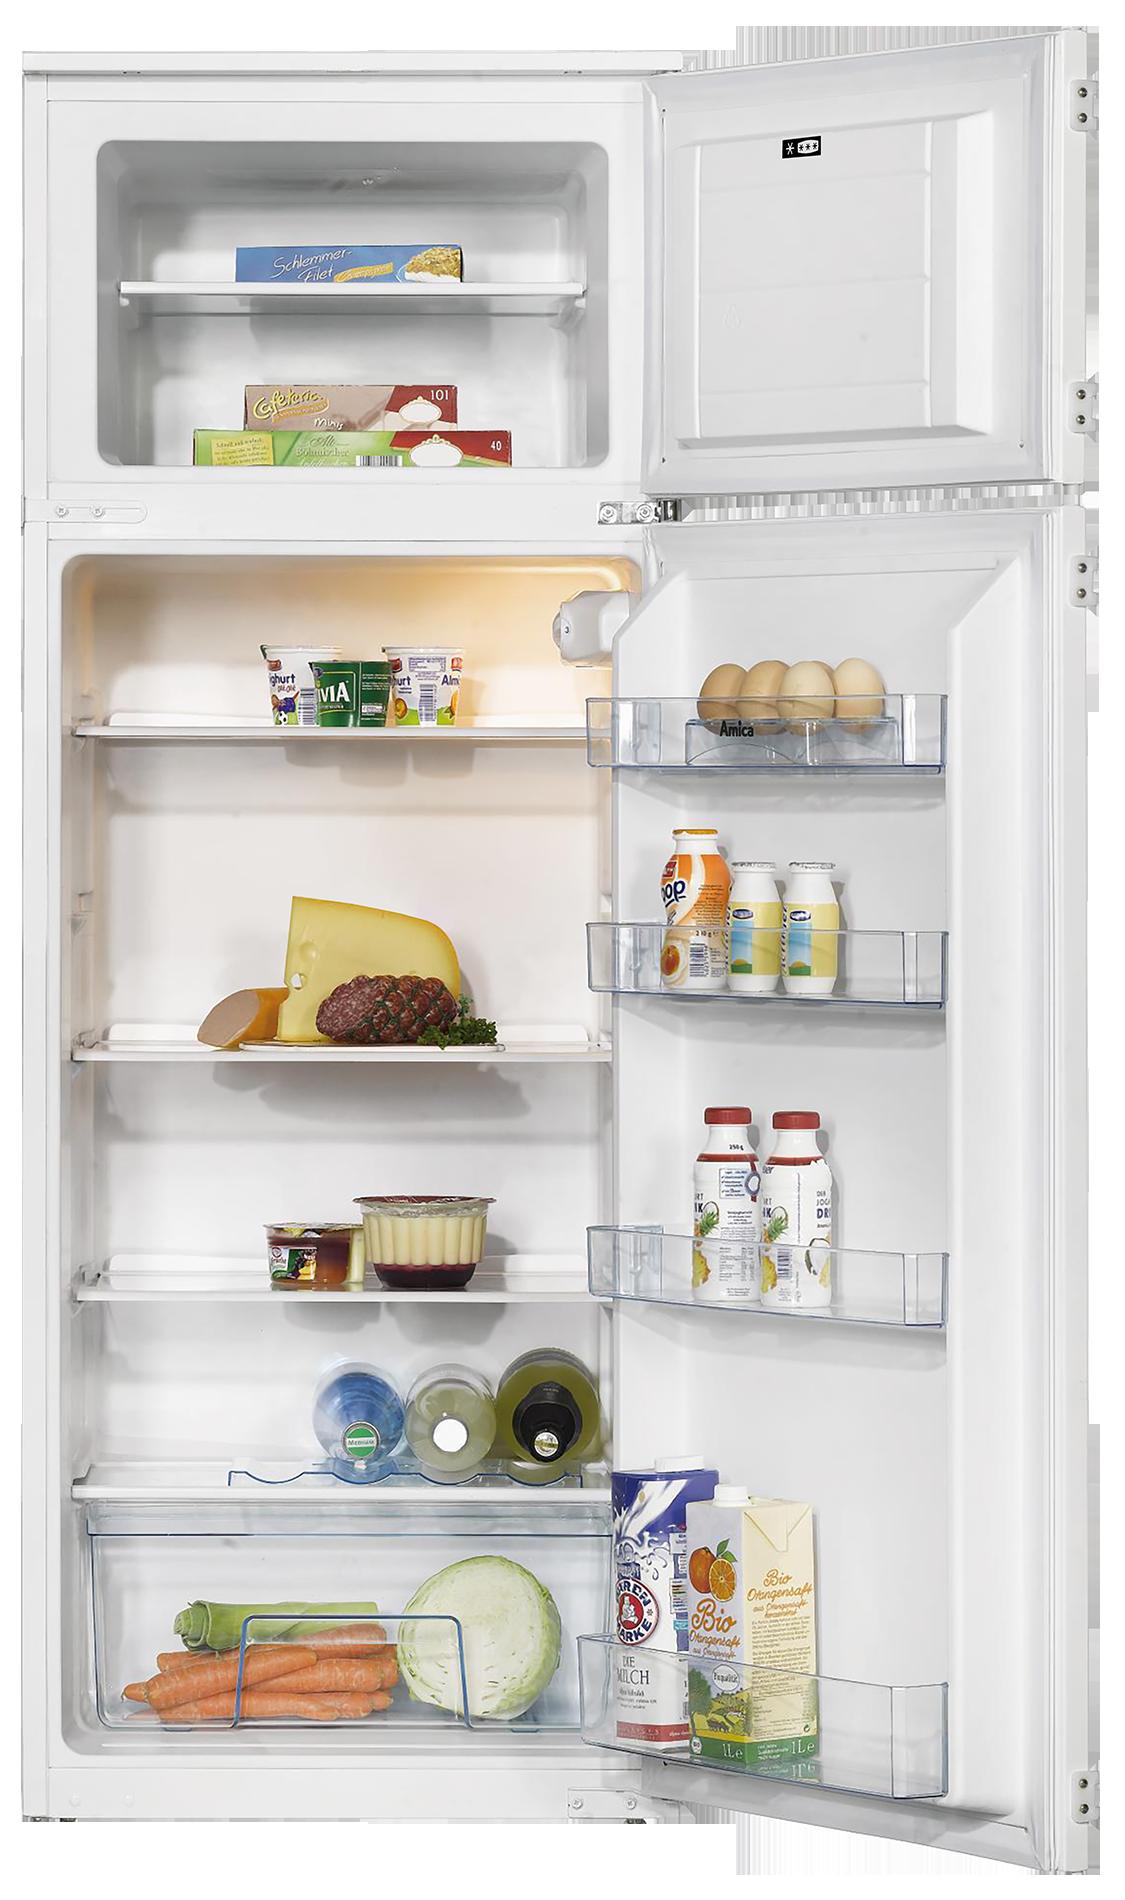 BD221.3 - Ugradbeni hladnjak